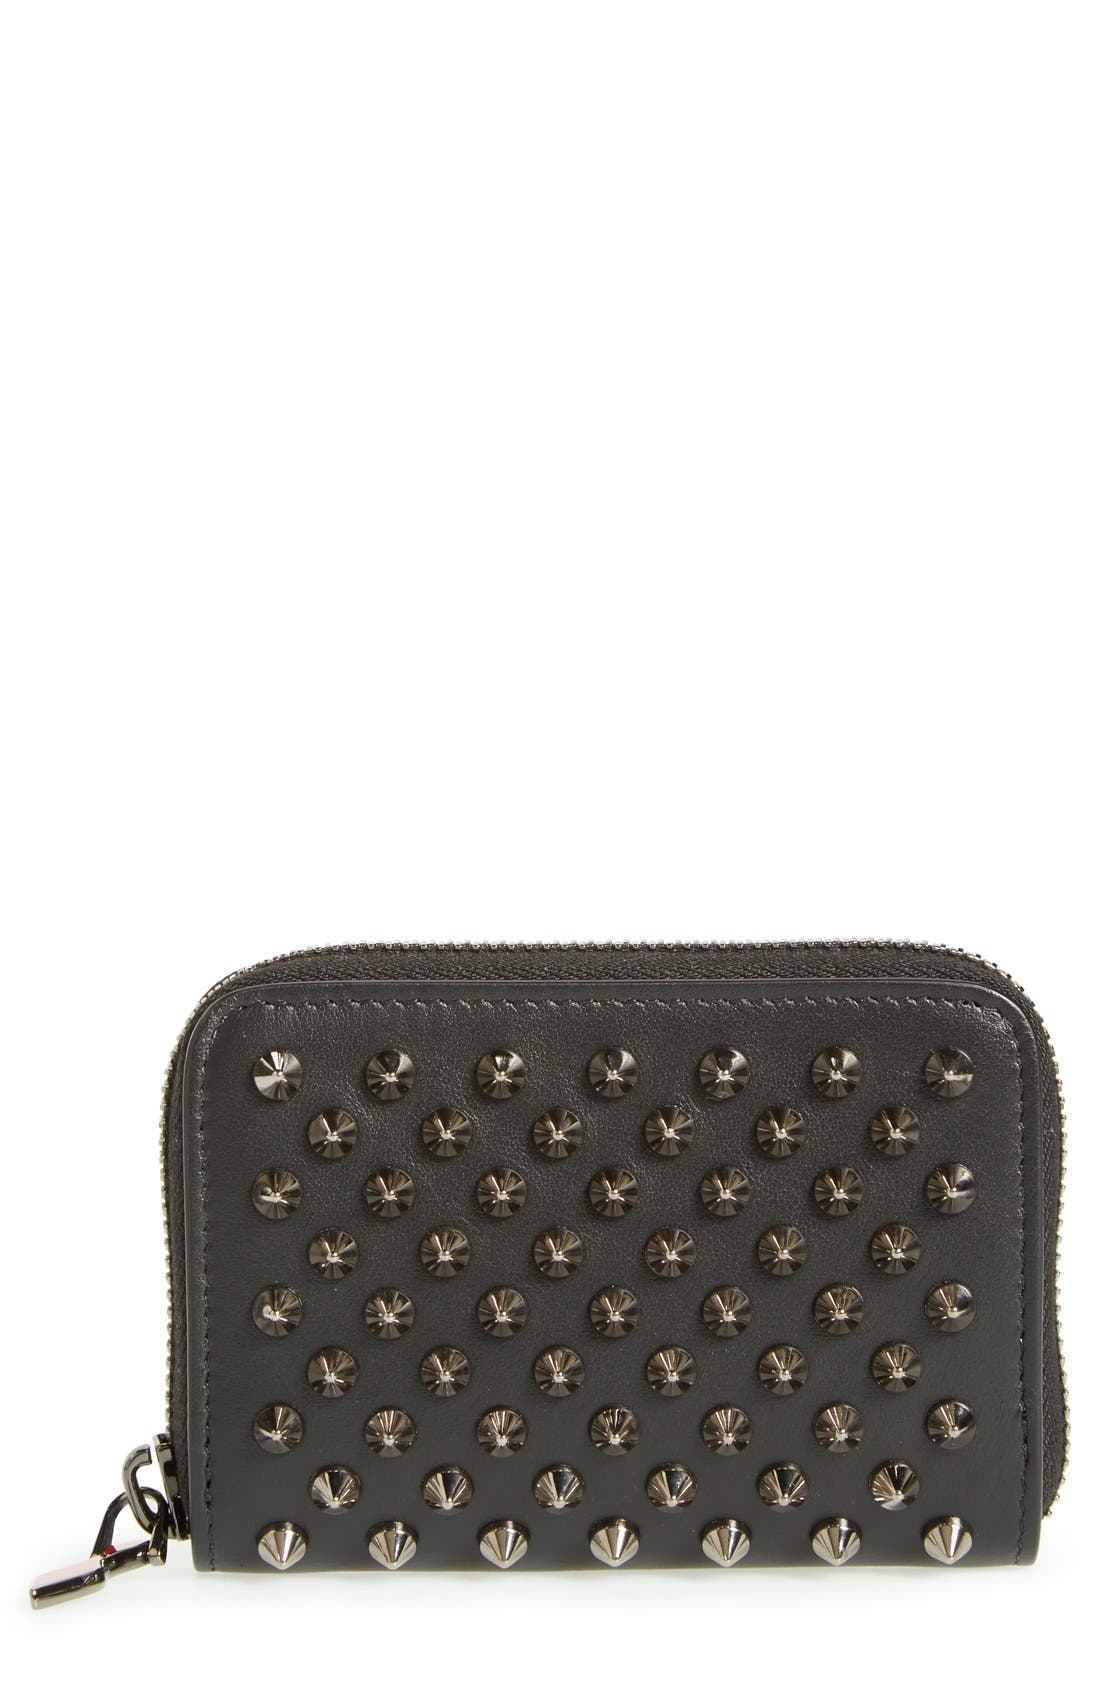 Christian Louboutin 'Panettone' Zip Around Calfskin Leather Wallet